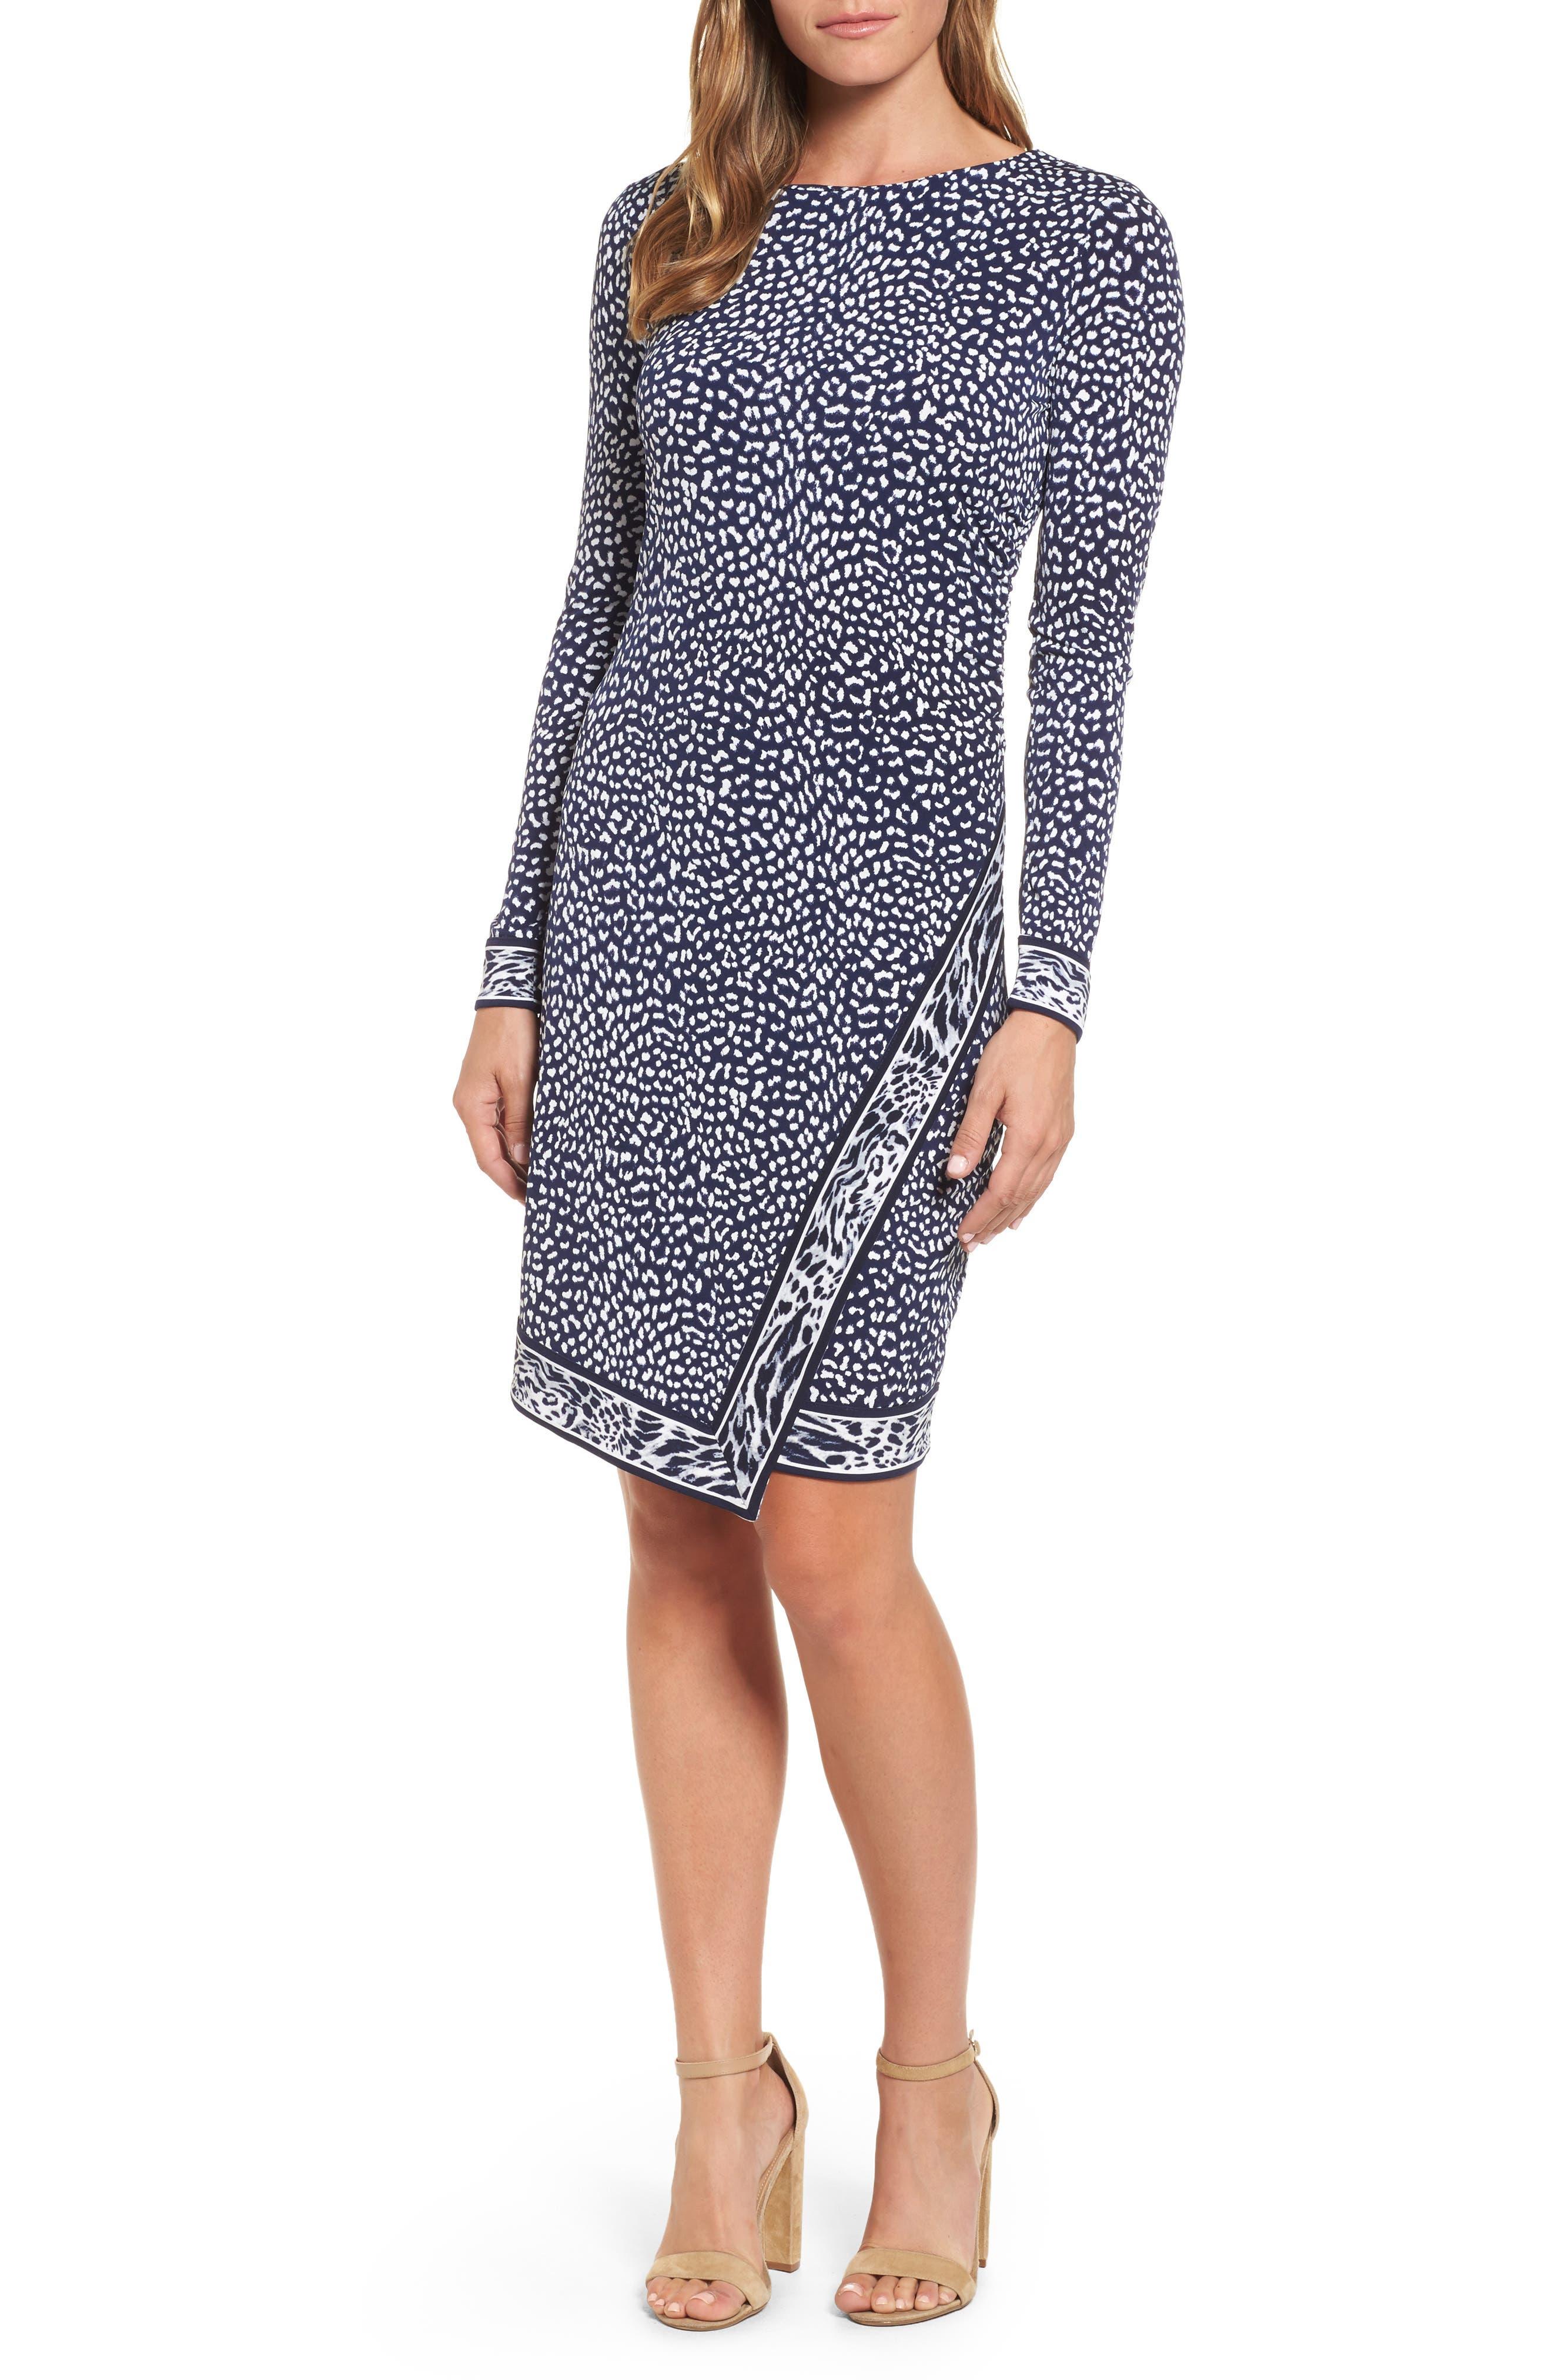 Main Image - MICHAEL Michael Kors Cheetah Border Print Sheath Dress